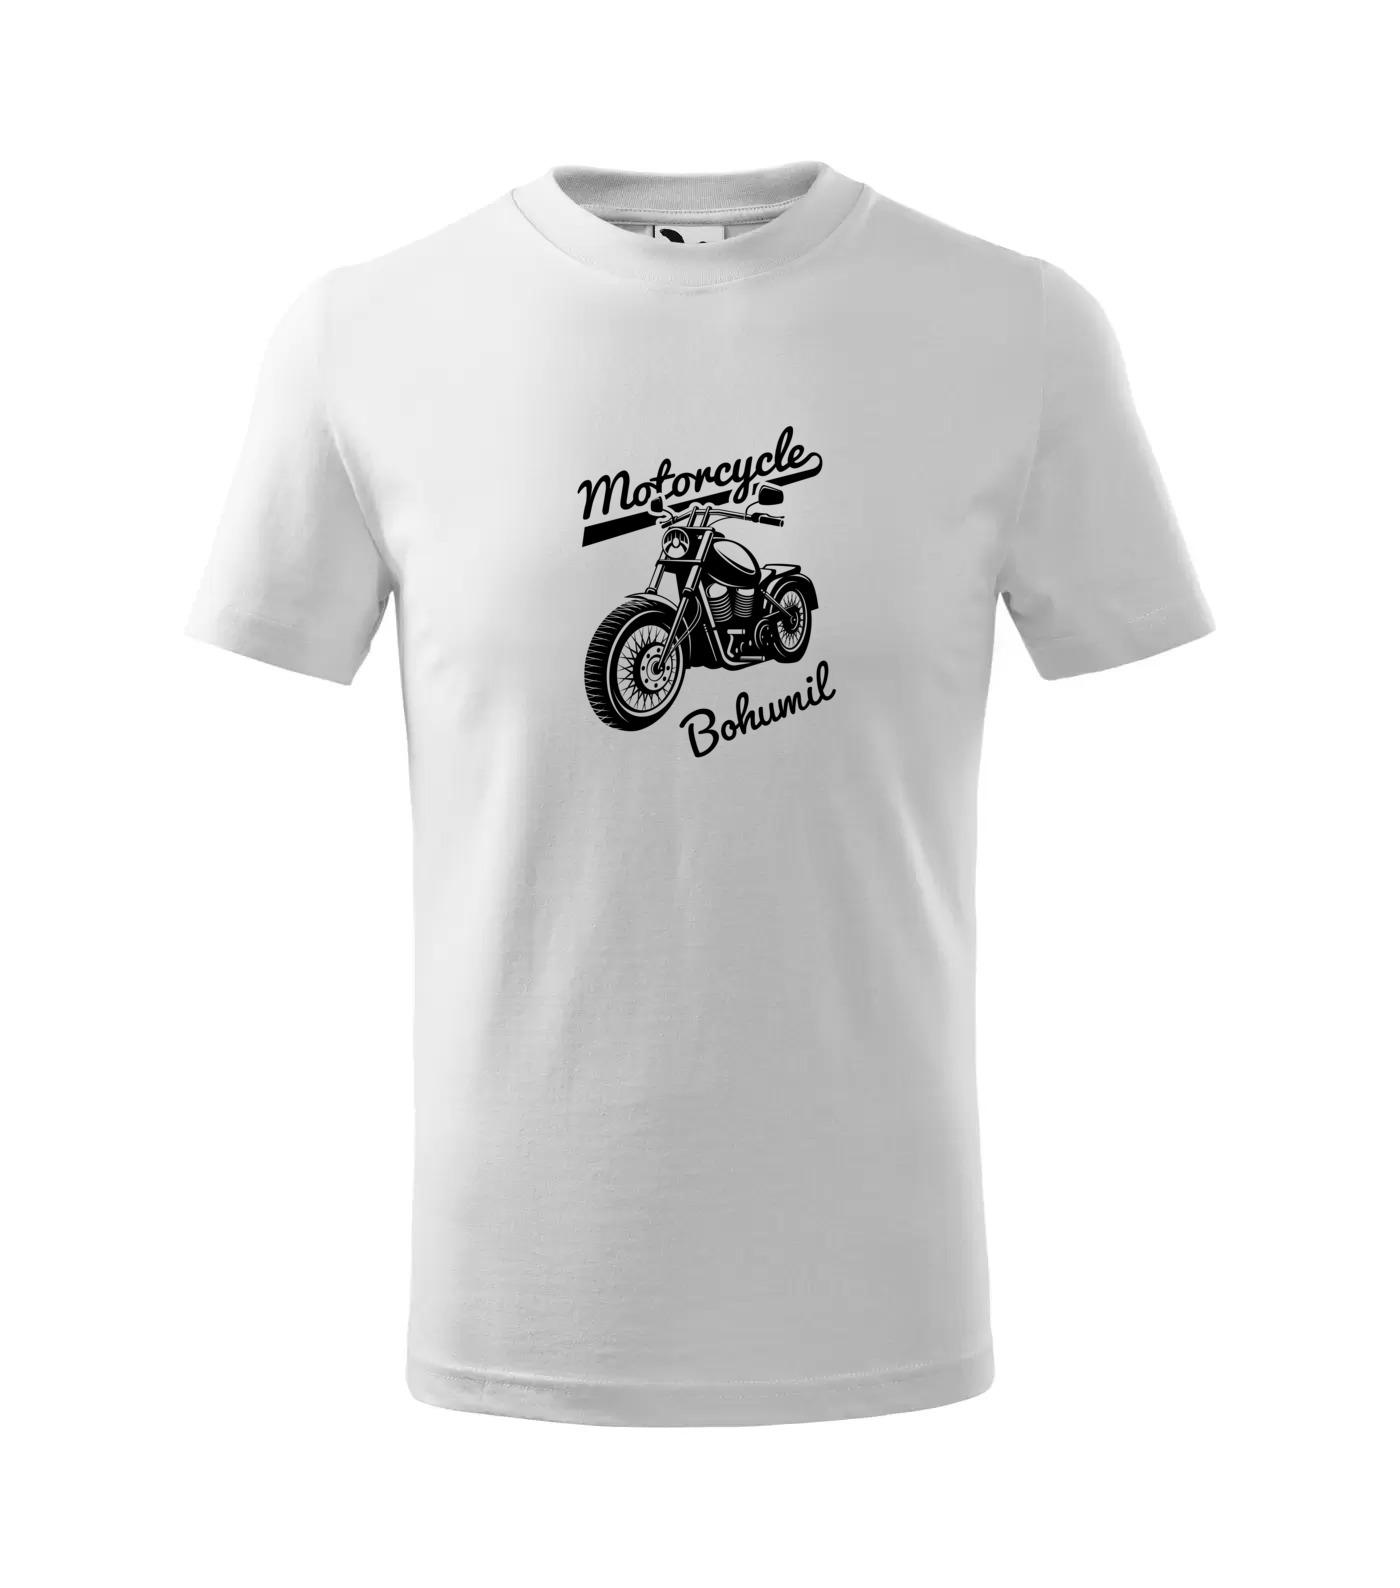 Tričko Motorkář Inverse Bohumil